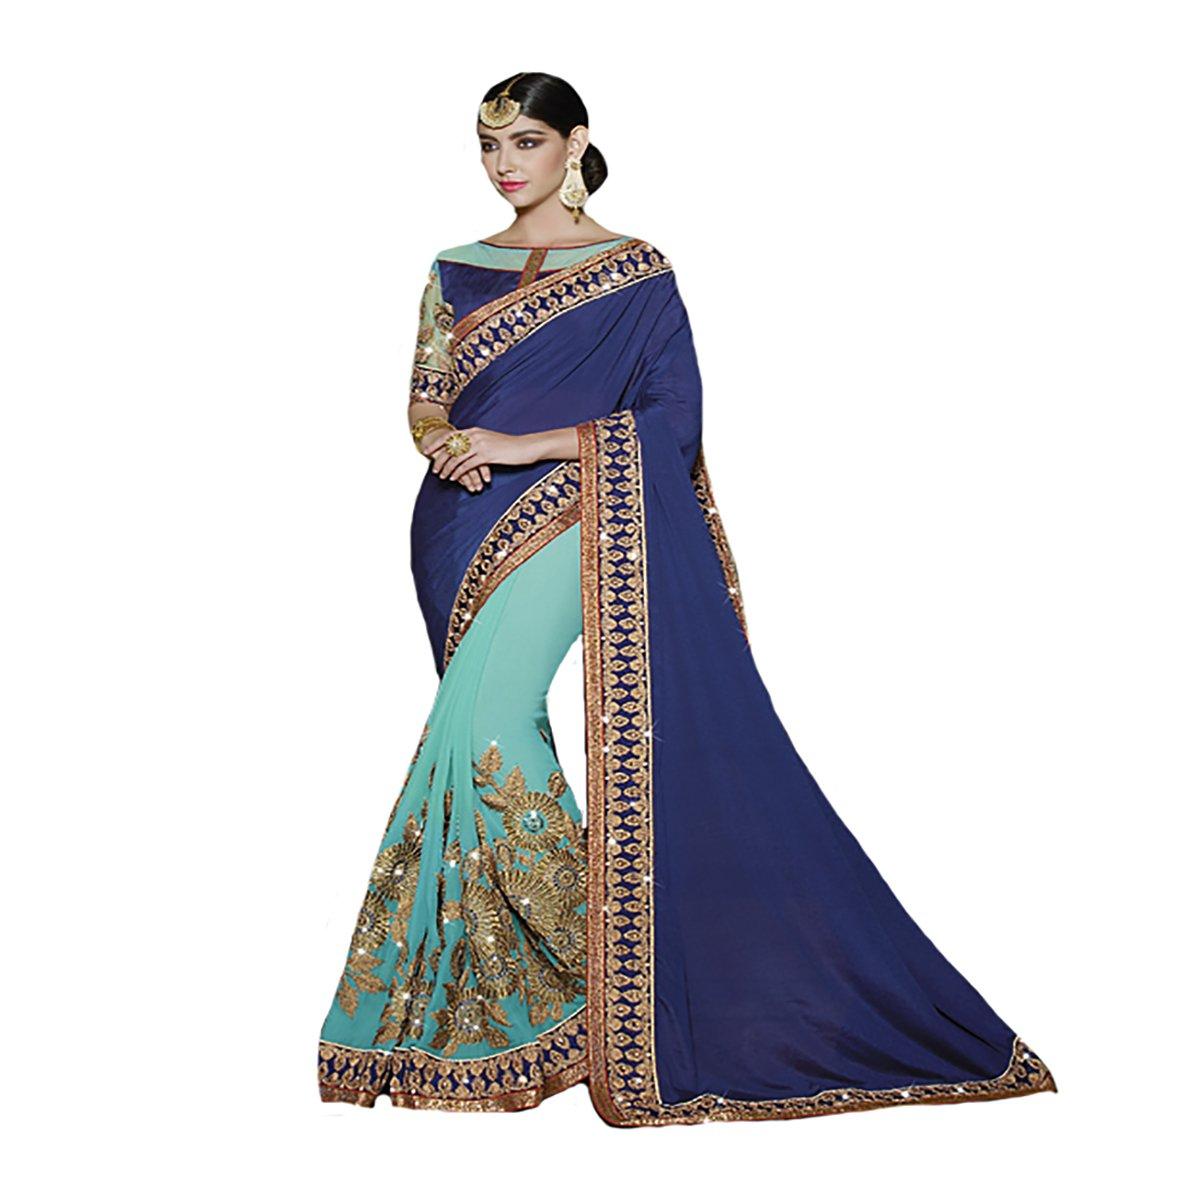 Bollywood New Launch Collection Indian Saree Sari Bridal Wedding Ceremony